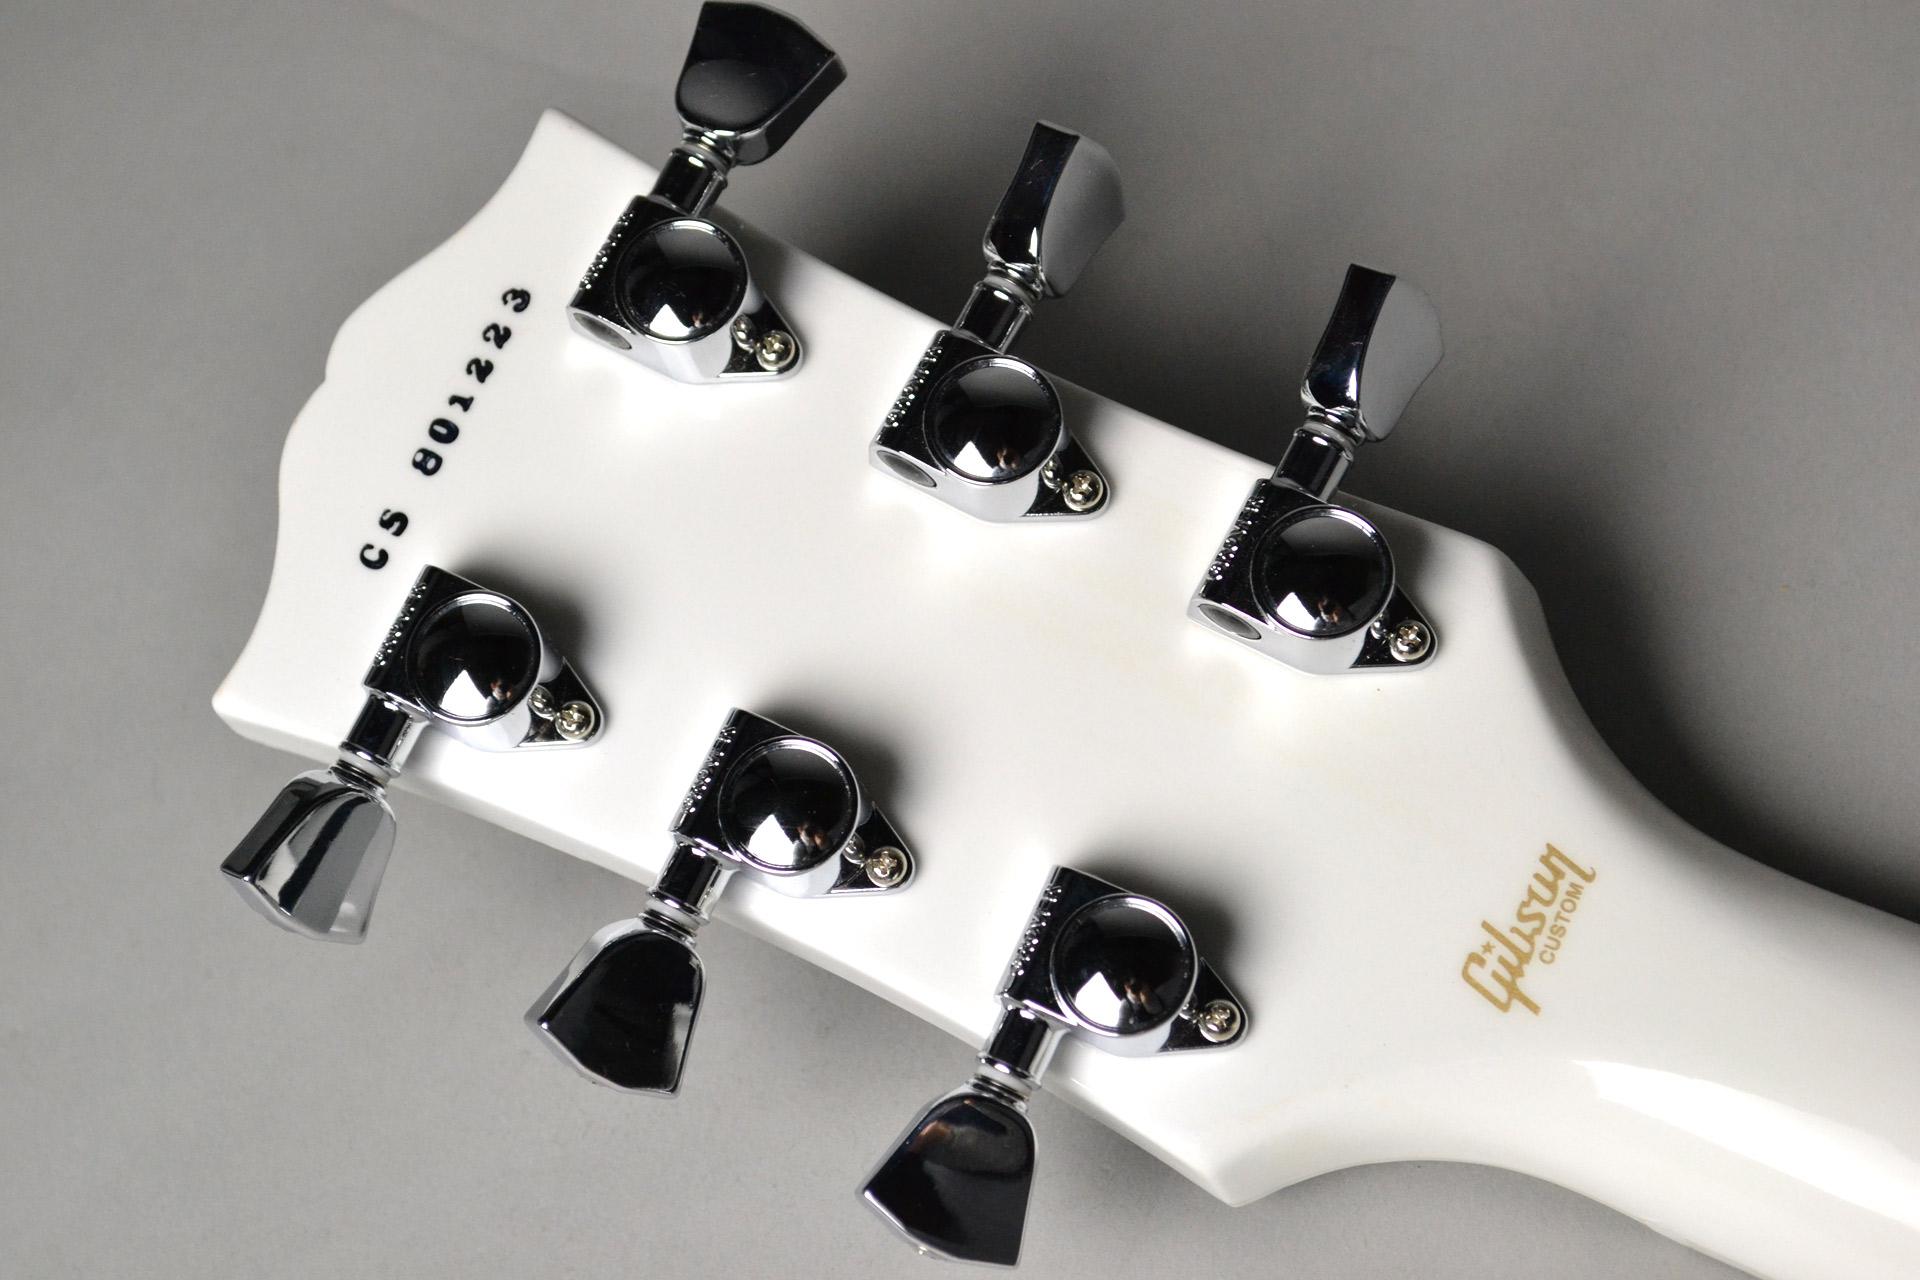 Les Paul Custom 3A Quilt Top Nordic Blue/Alpine White 【ホワイトバック!】のヘッド裏-アップ画像